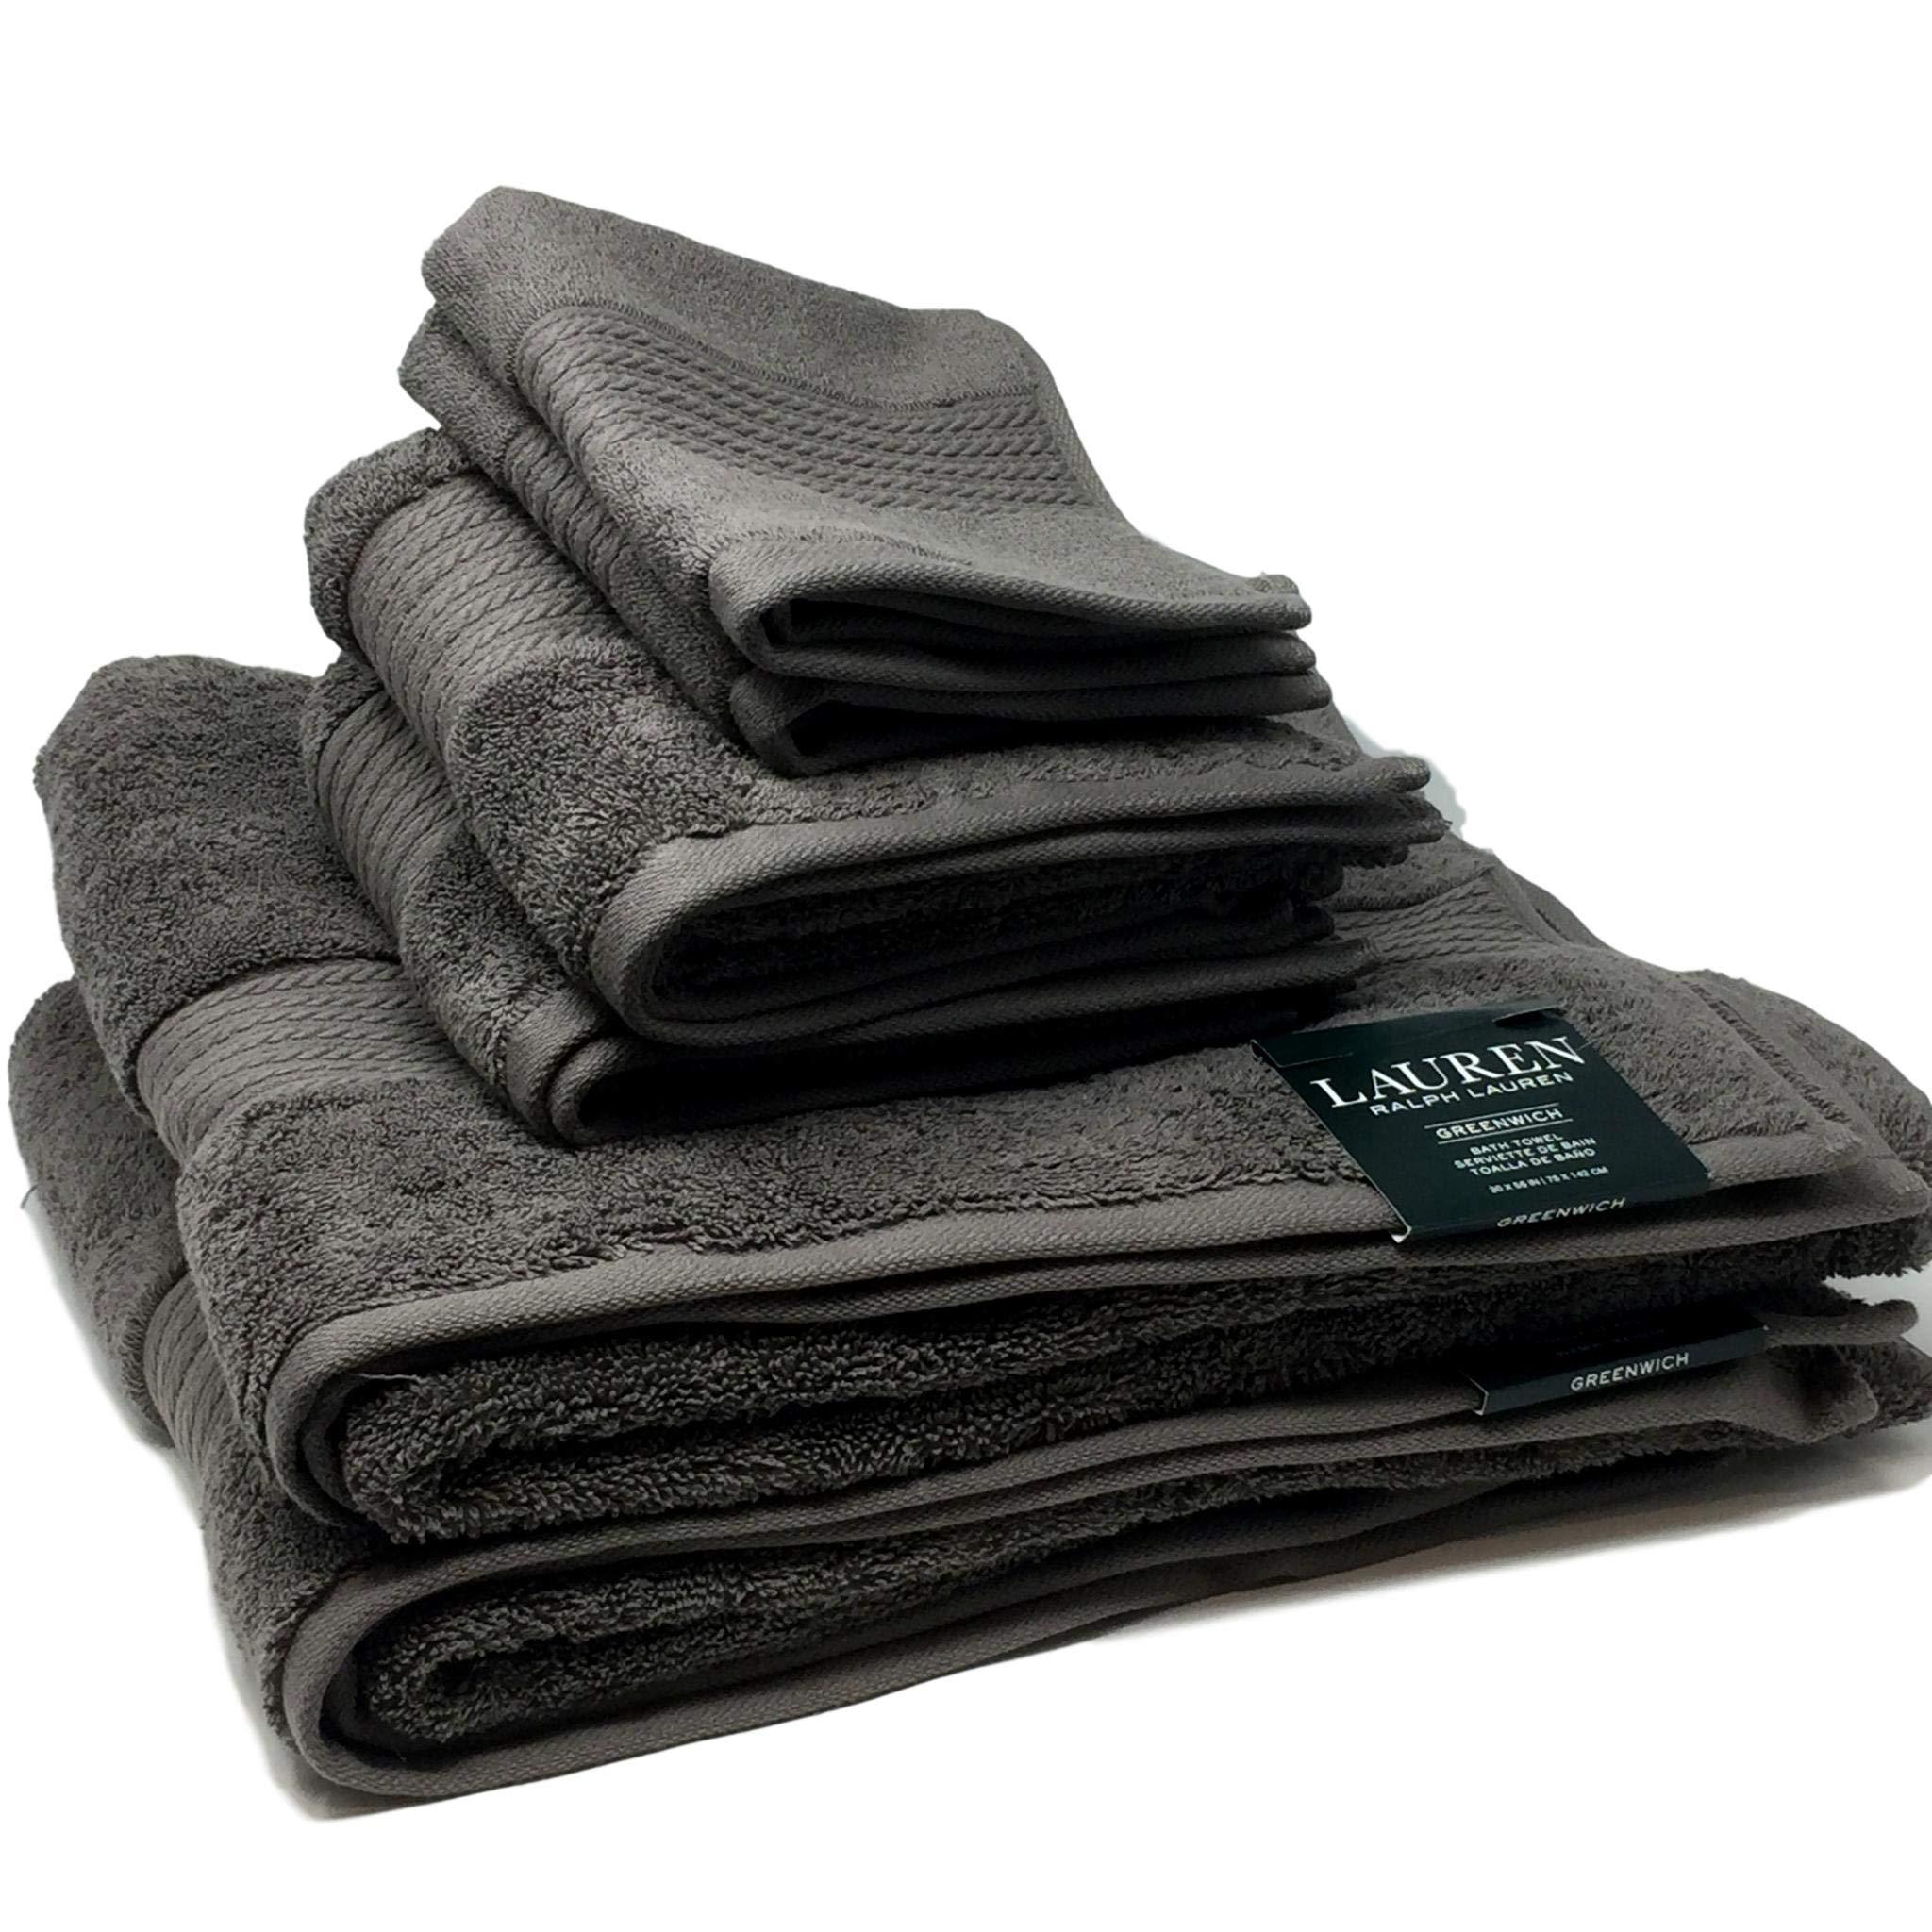 Lauren by Ralph Lauren Greenwich Pebble (Dark Gray) Towel Set - 2 Bath Towels, 2 Hand Towels and 2 Wash Cloths